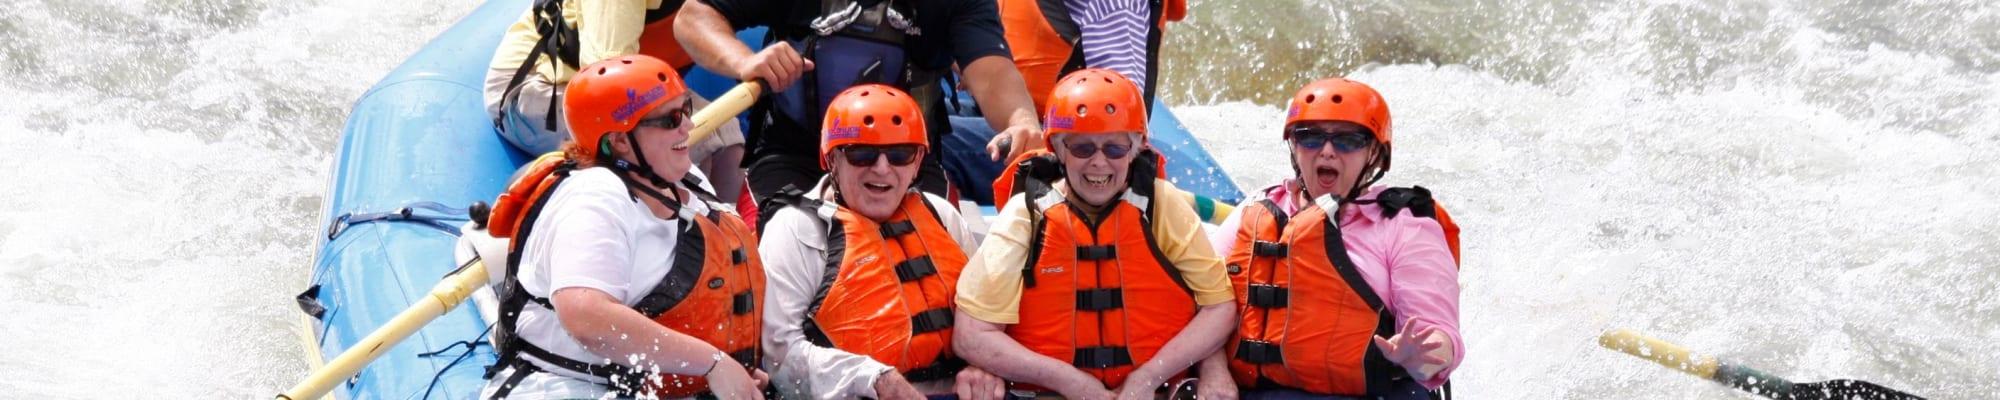 Blog at Julian Estates Gracious Retirement Living in Puyallup, Washington